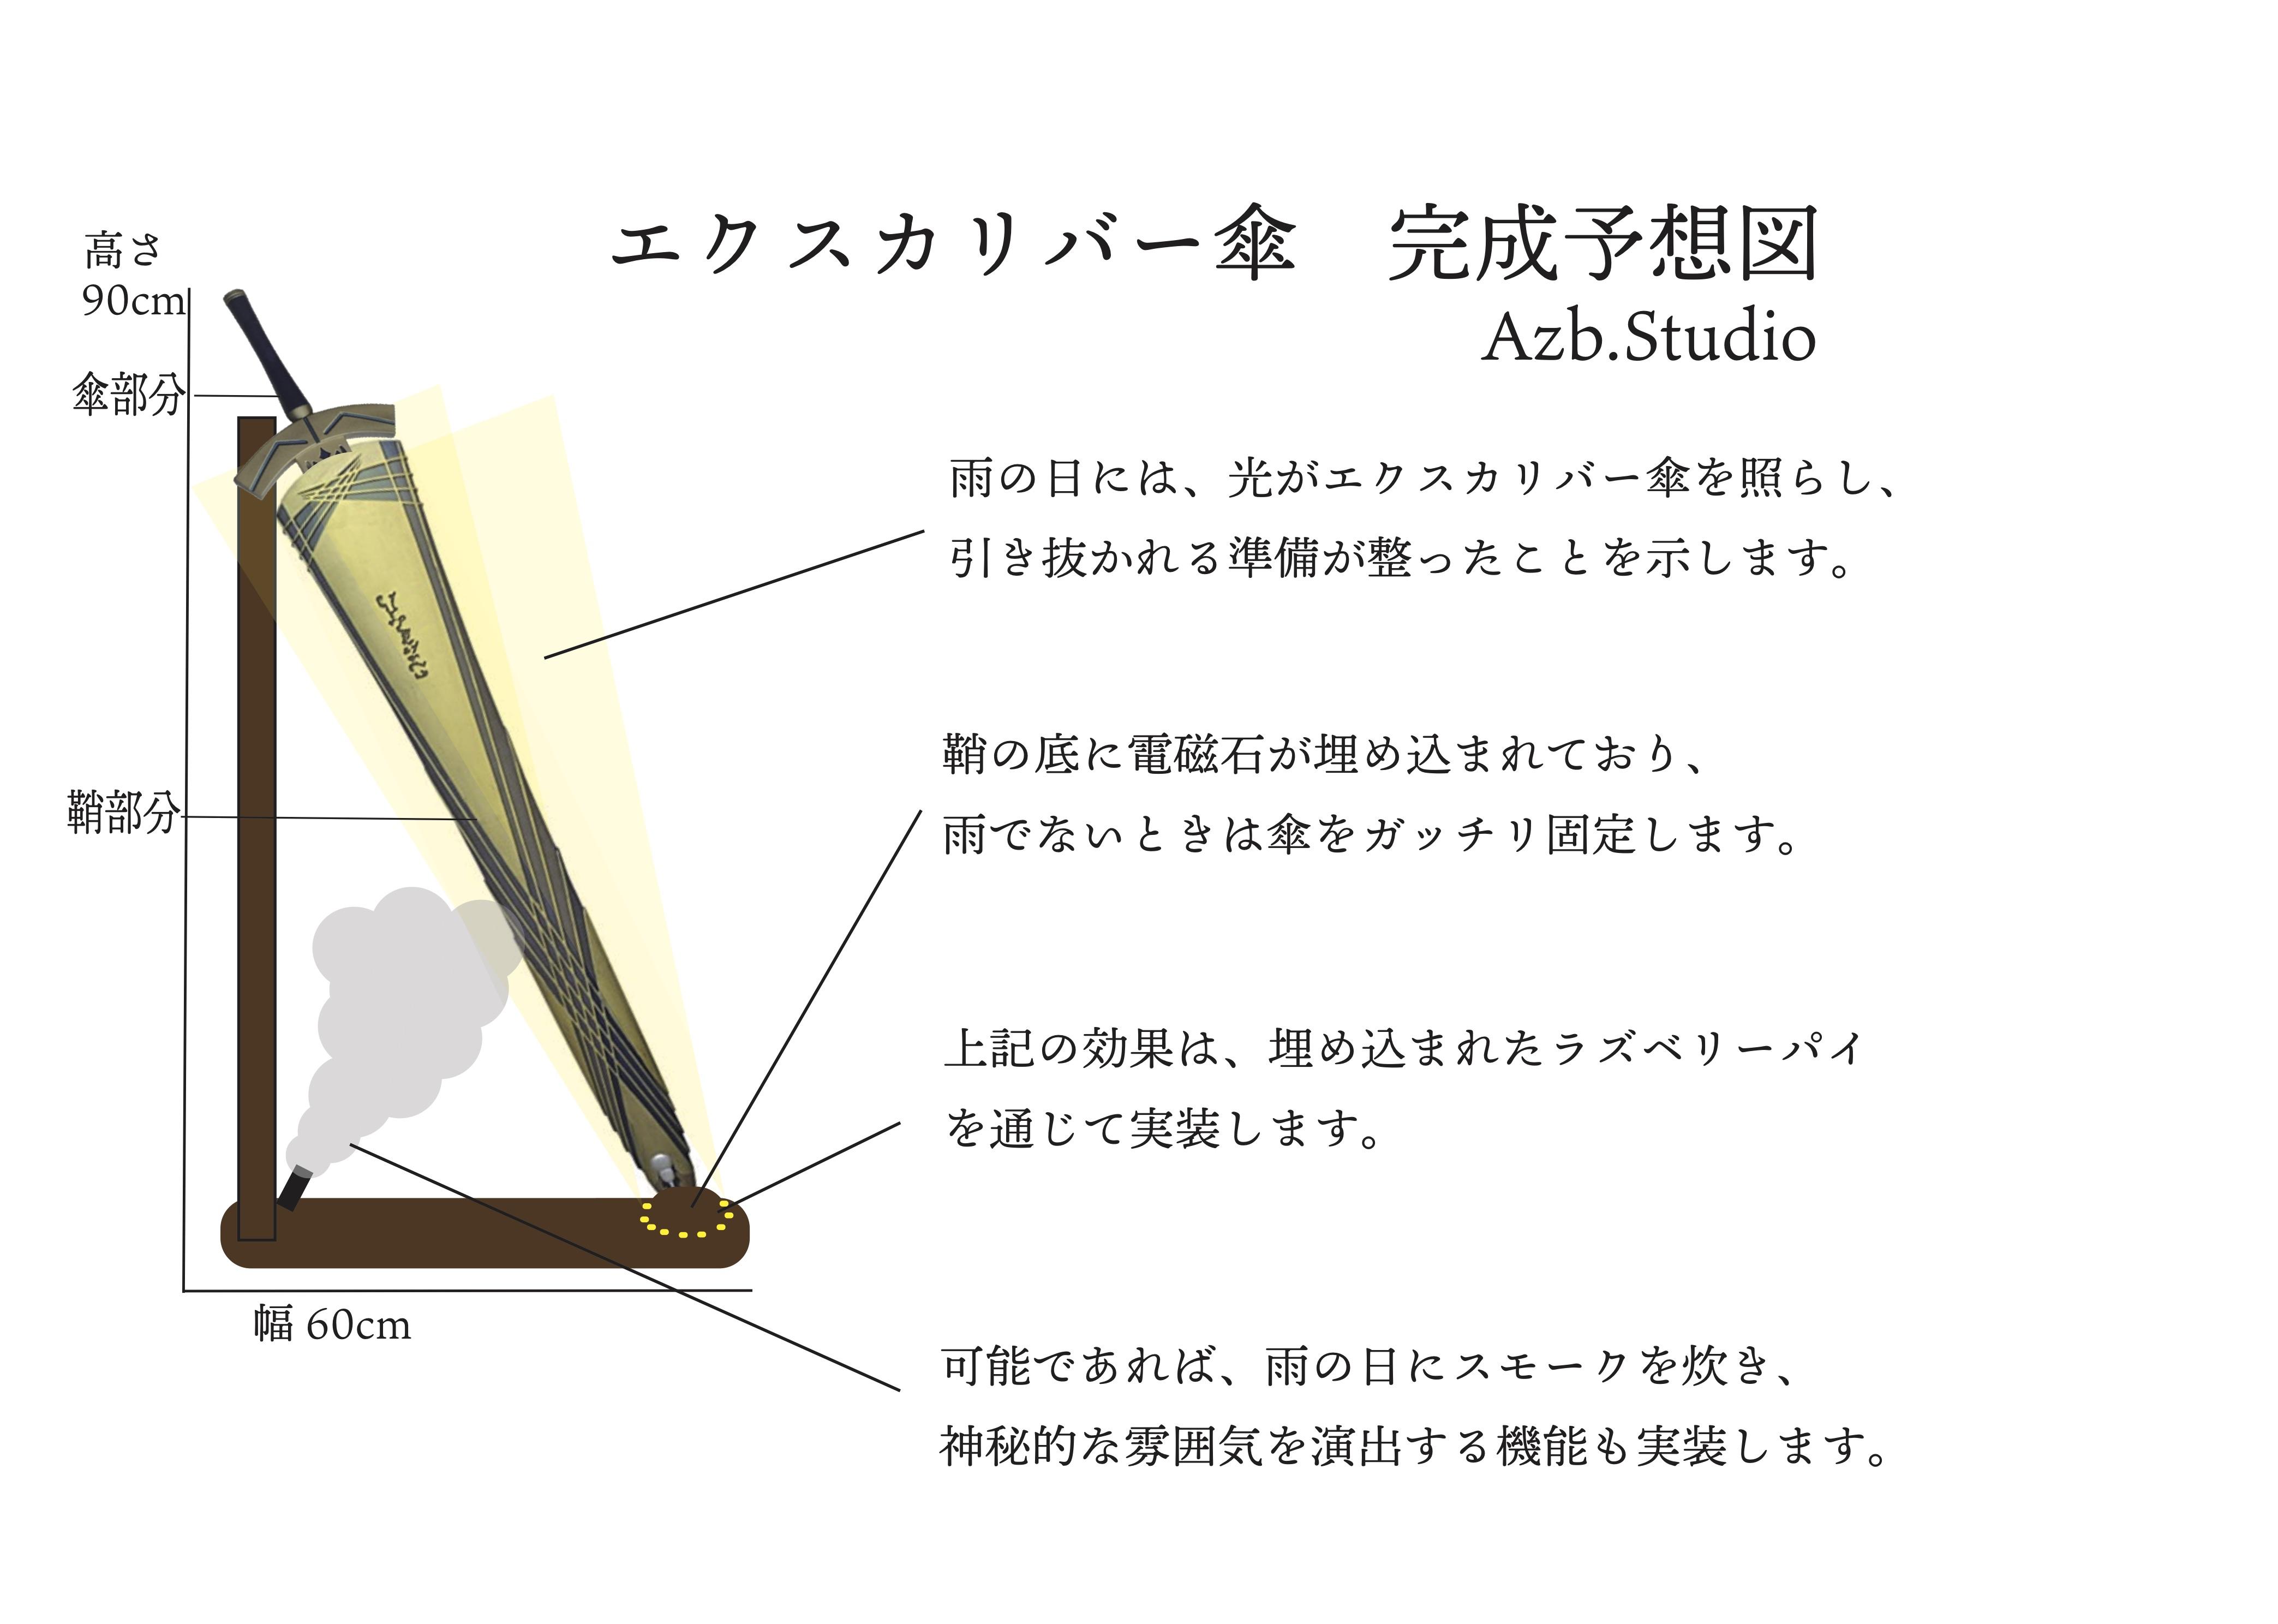 Azb.Studio